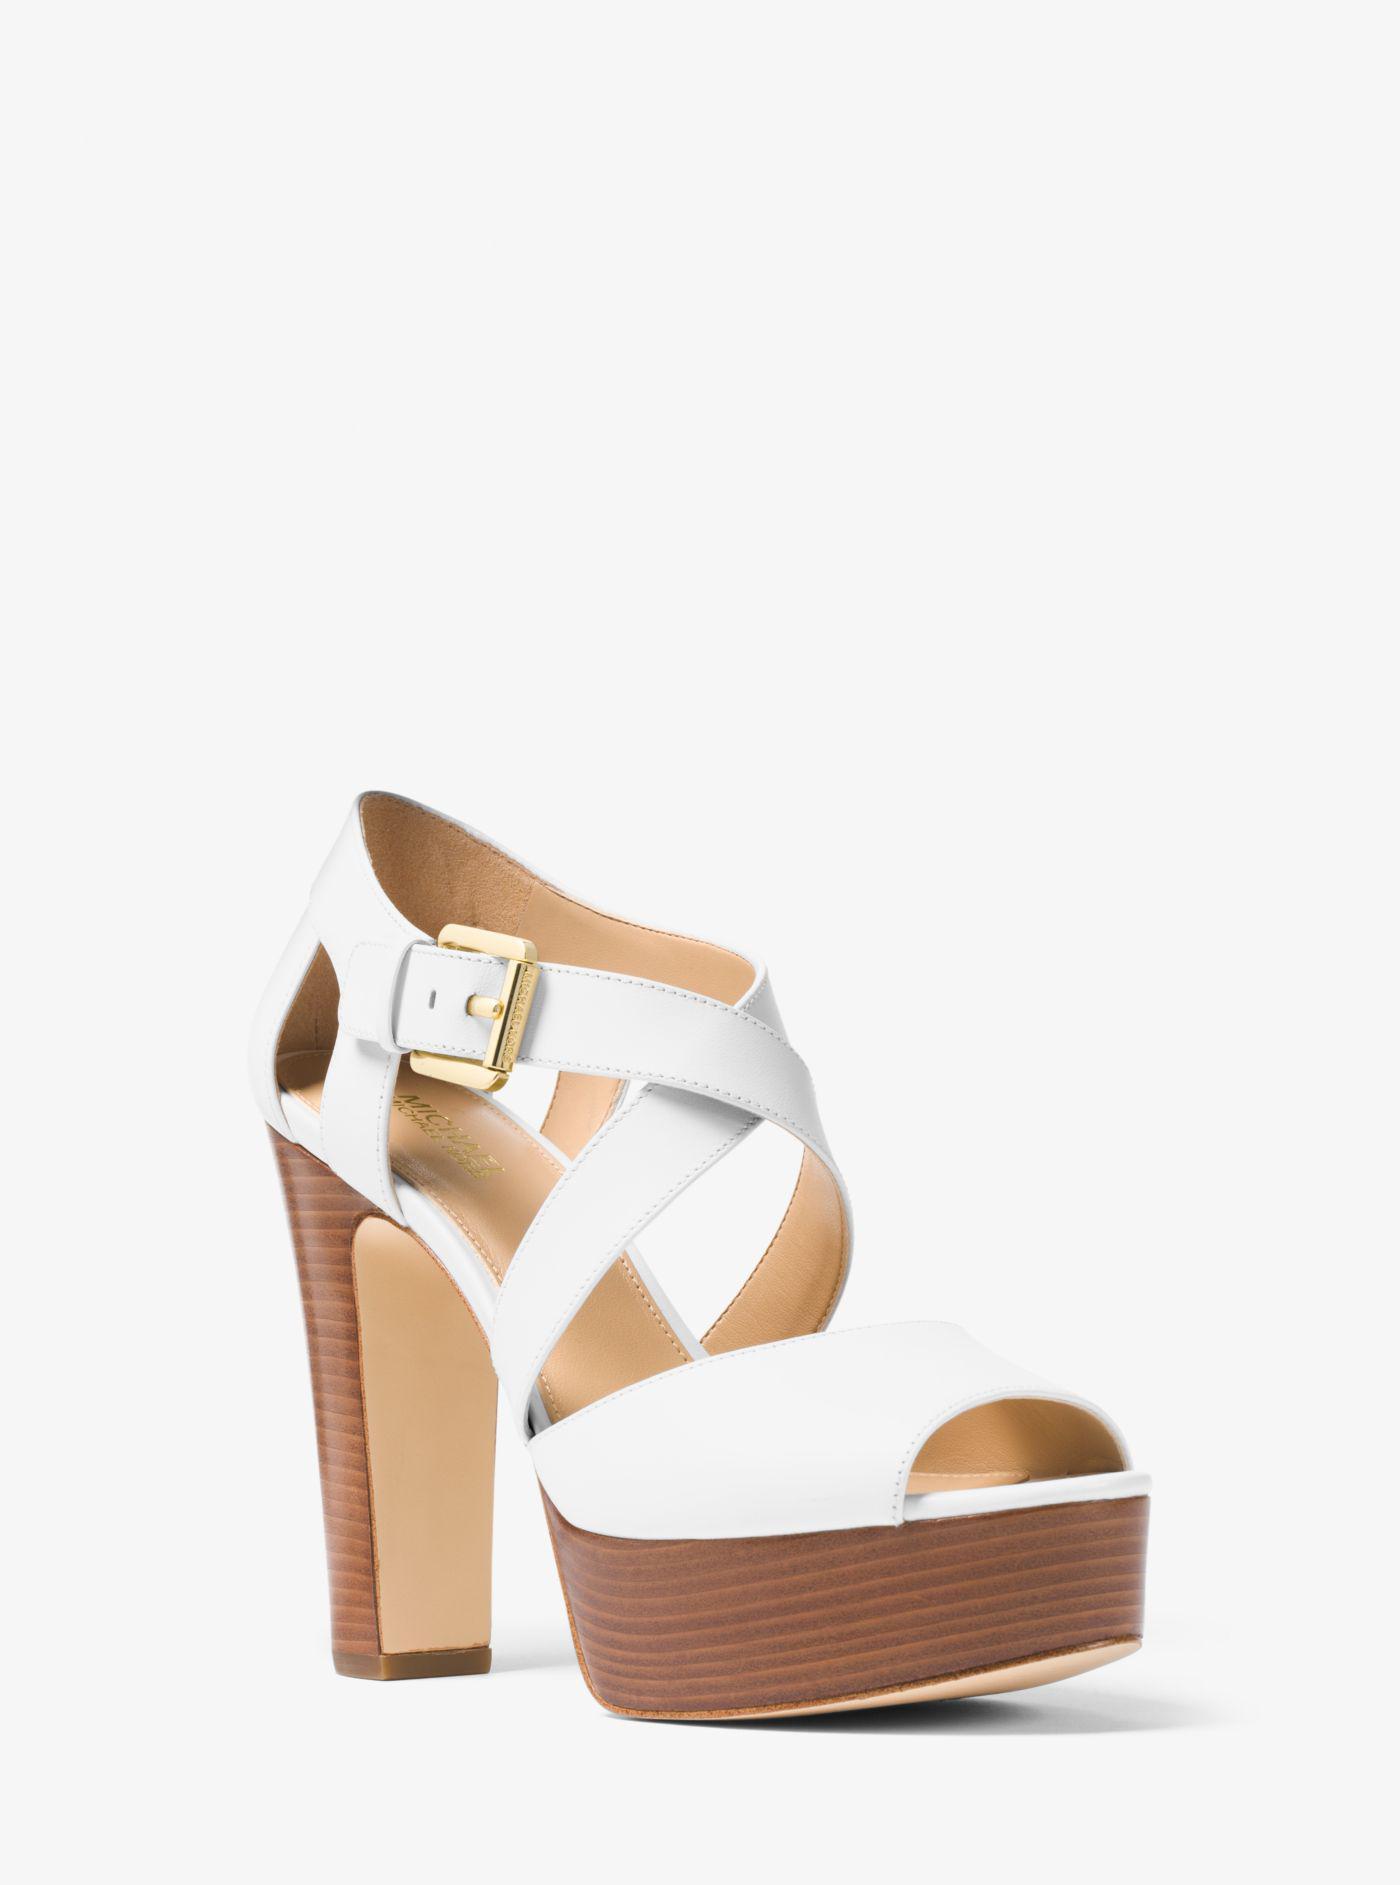 a66ebfa4c8 Michael Kors Jodi Leather Platform Sandal in White - Lyst